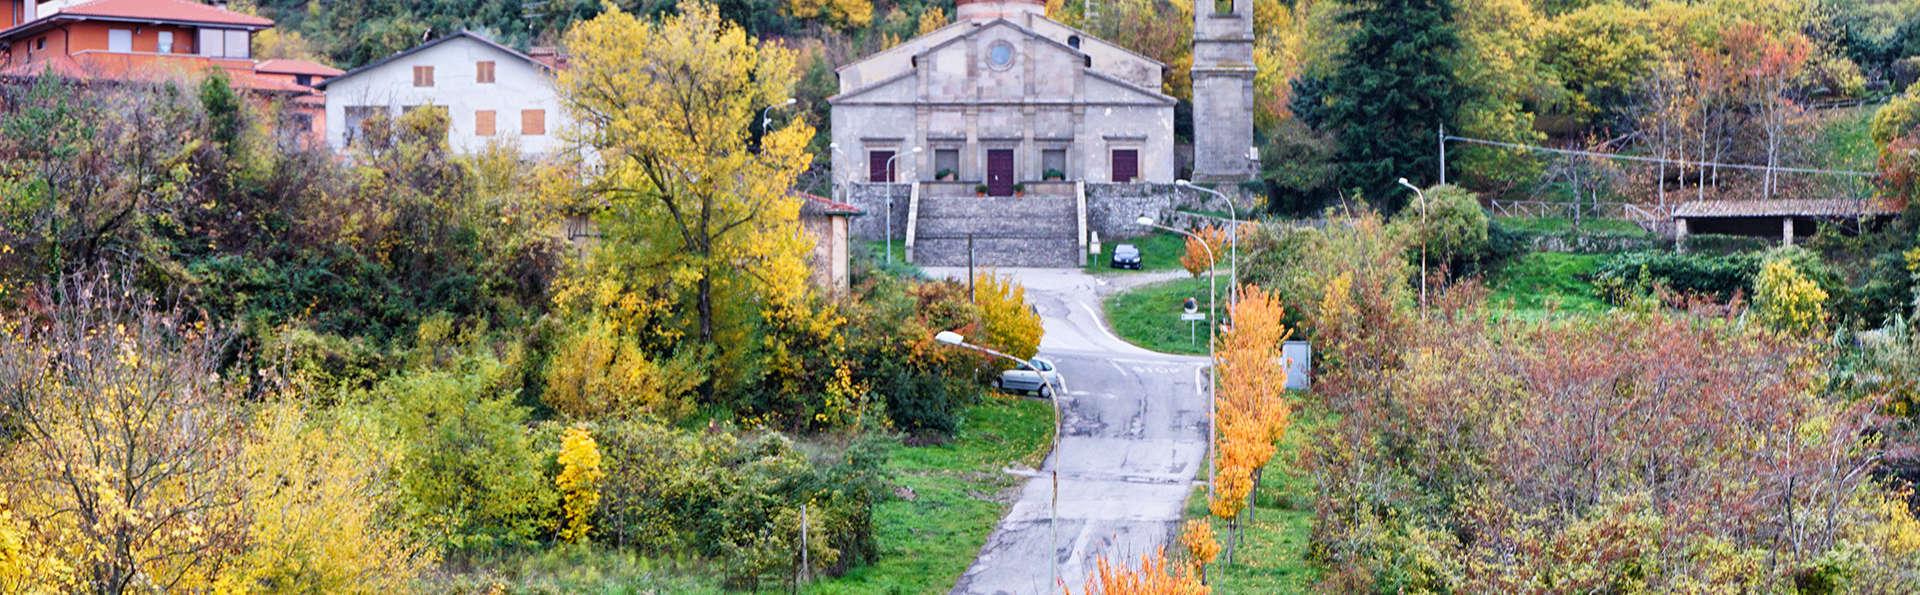 Agriturismo Bio I Rondinelli - Arcidosso, Italia